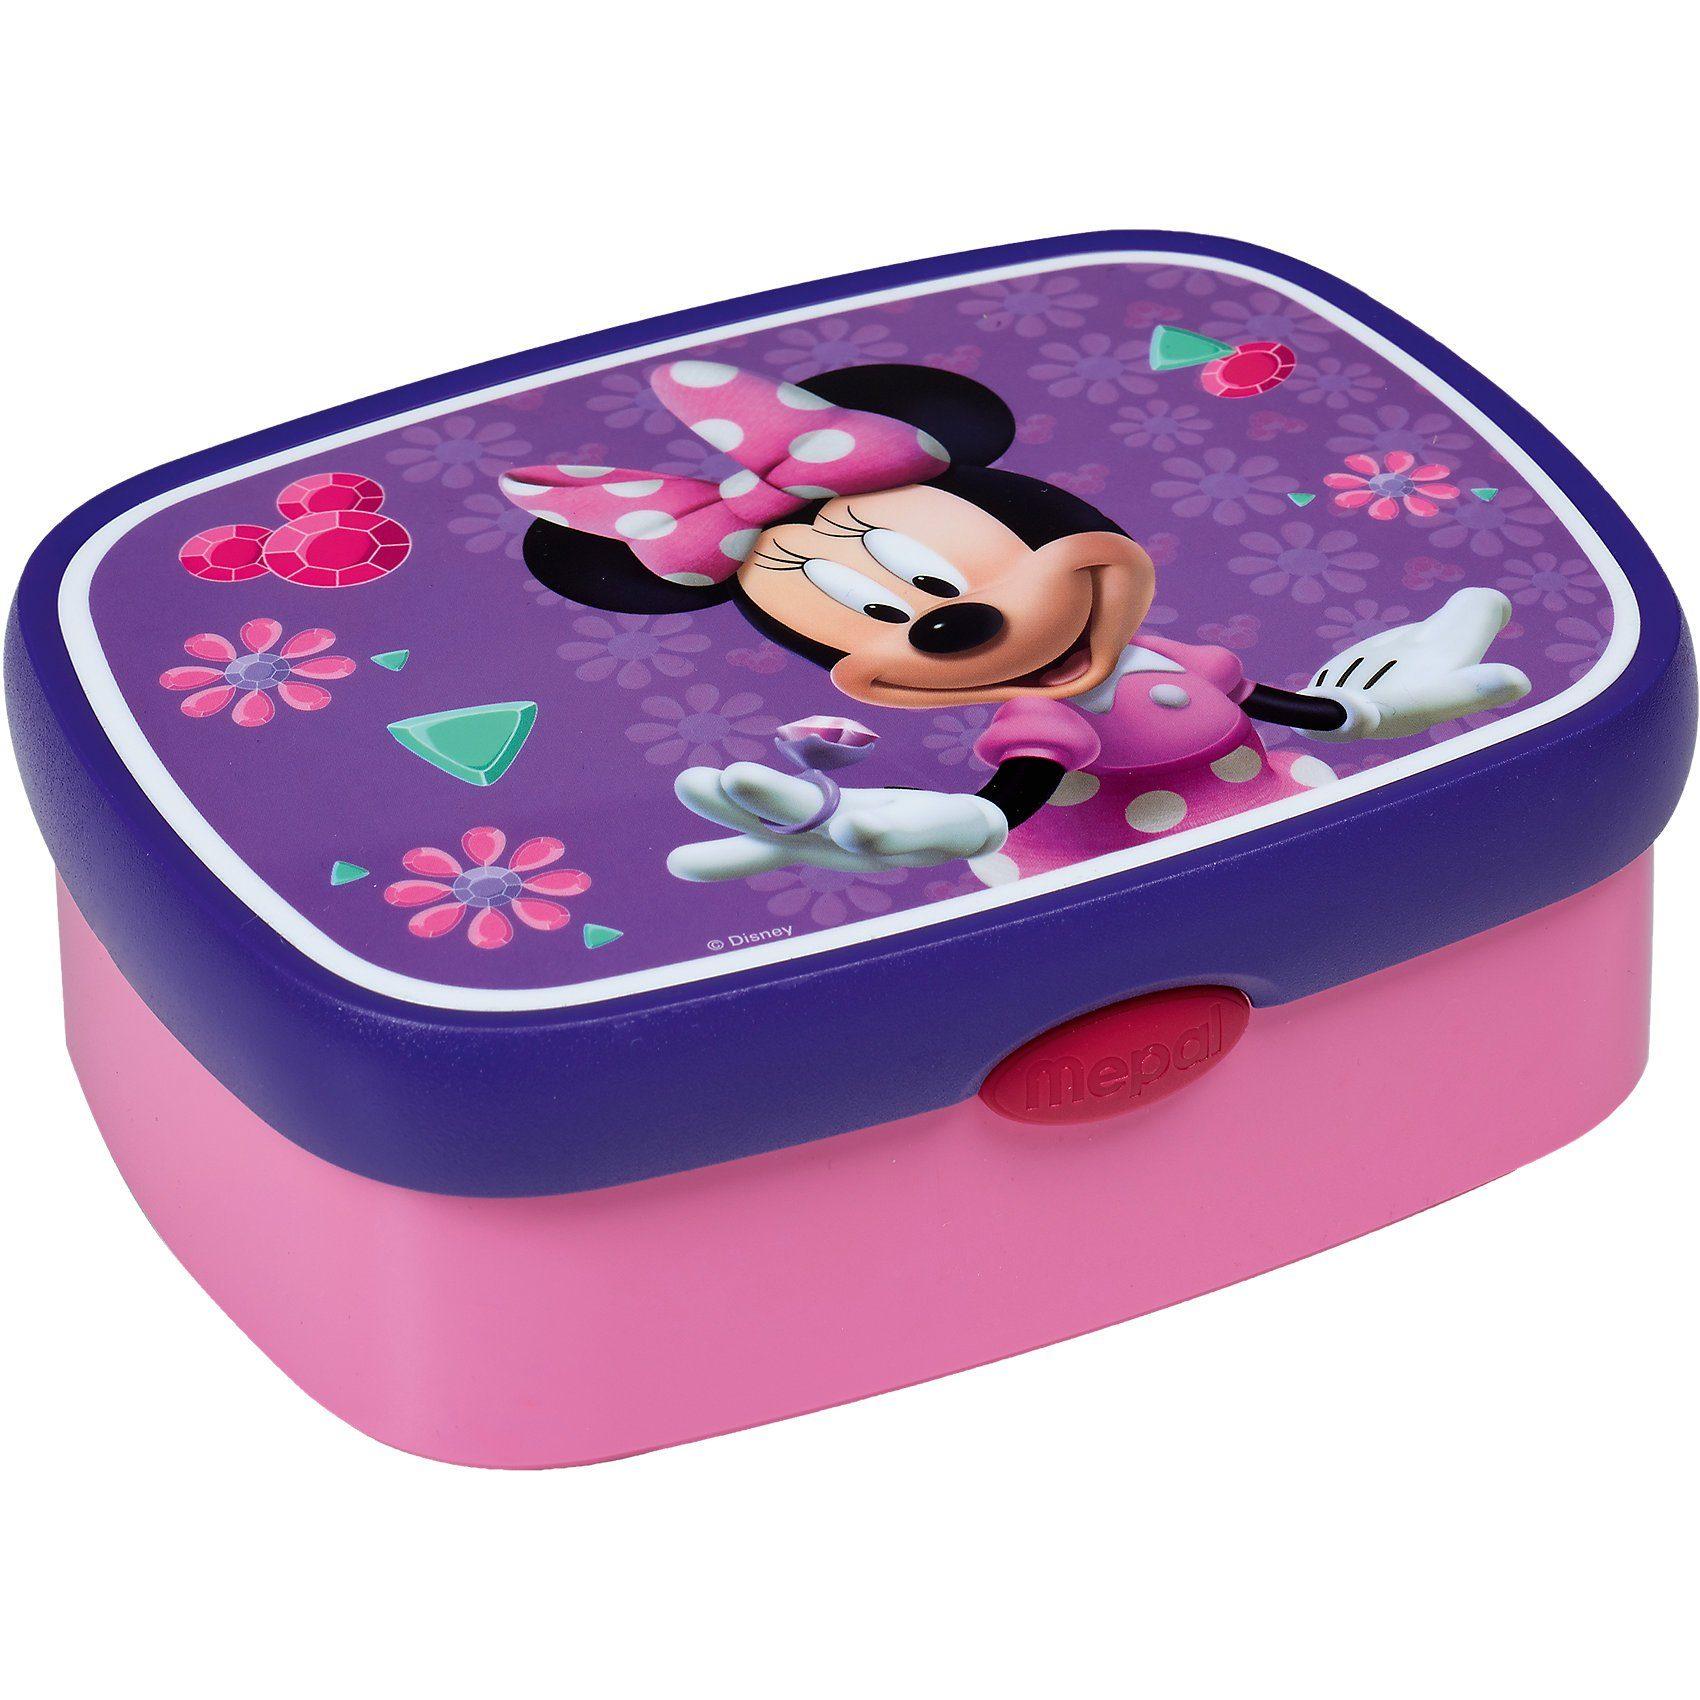 Campus Brotdose midi - Minnie Mouse